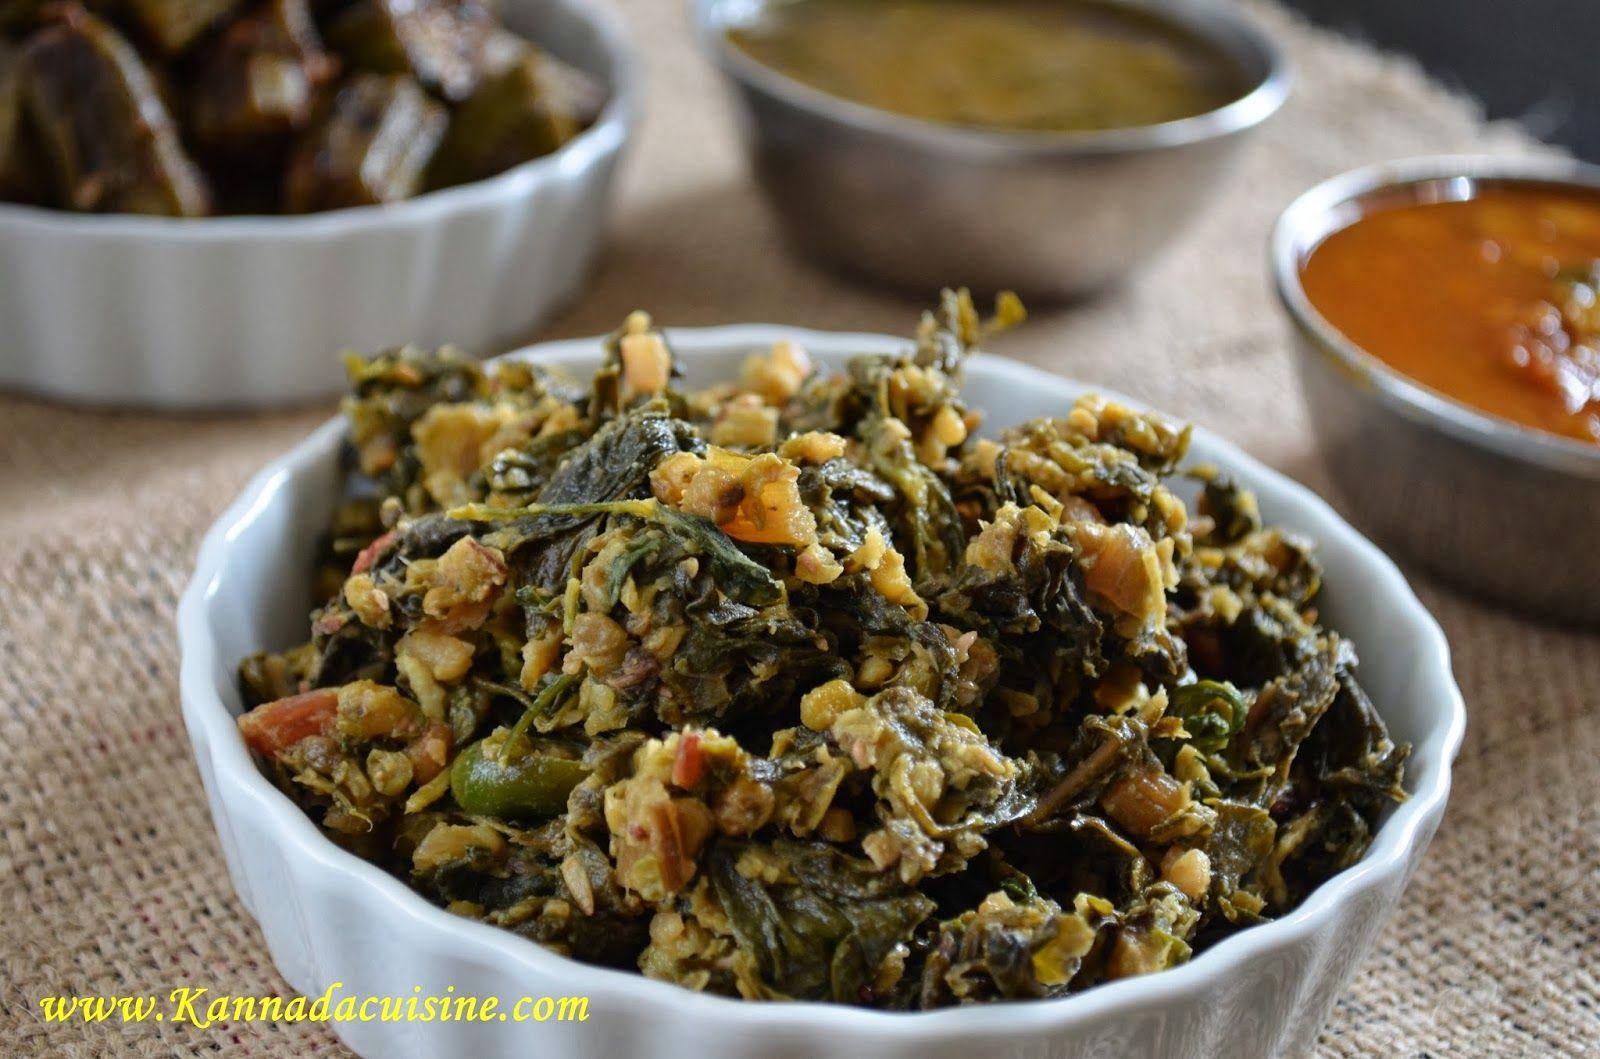 Kannada cuisine soppu bele palya karnataka veg manglore udipi kannada cuisine soppu bele palya forumfinder Gallery